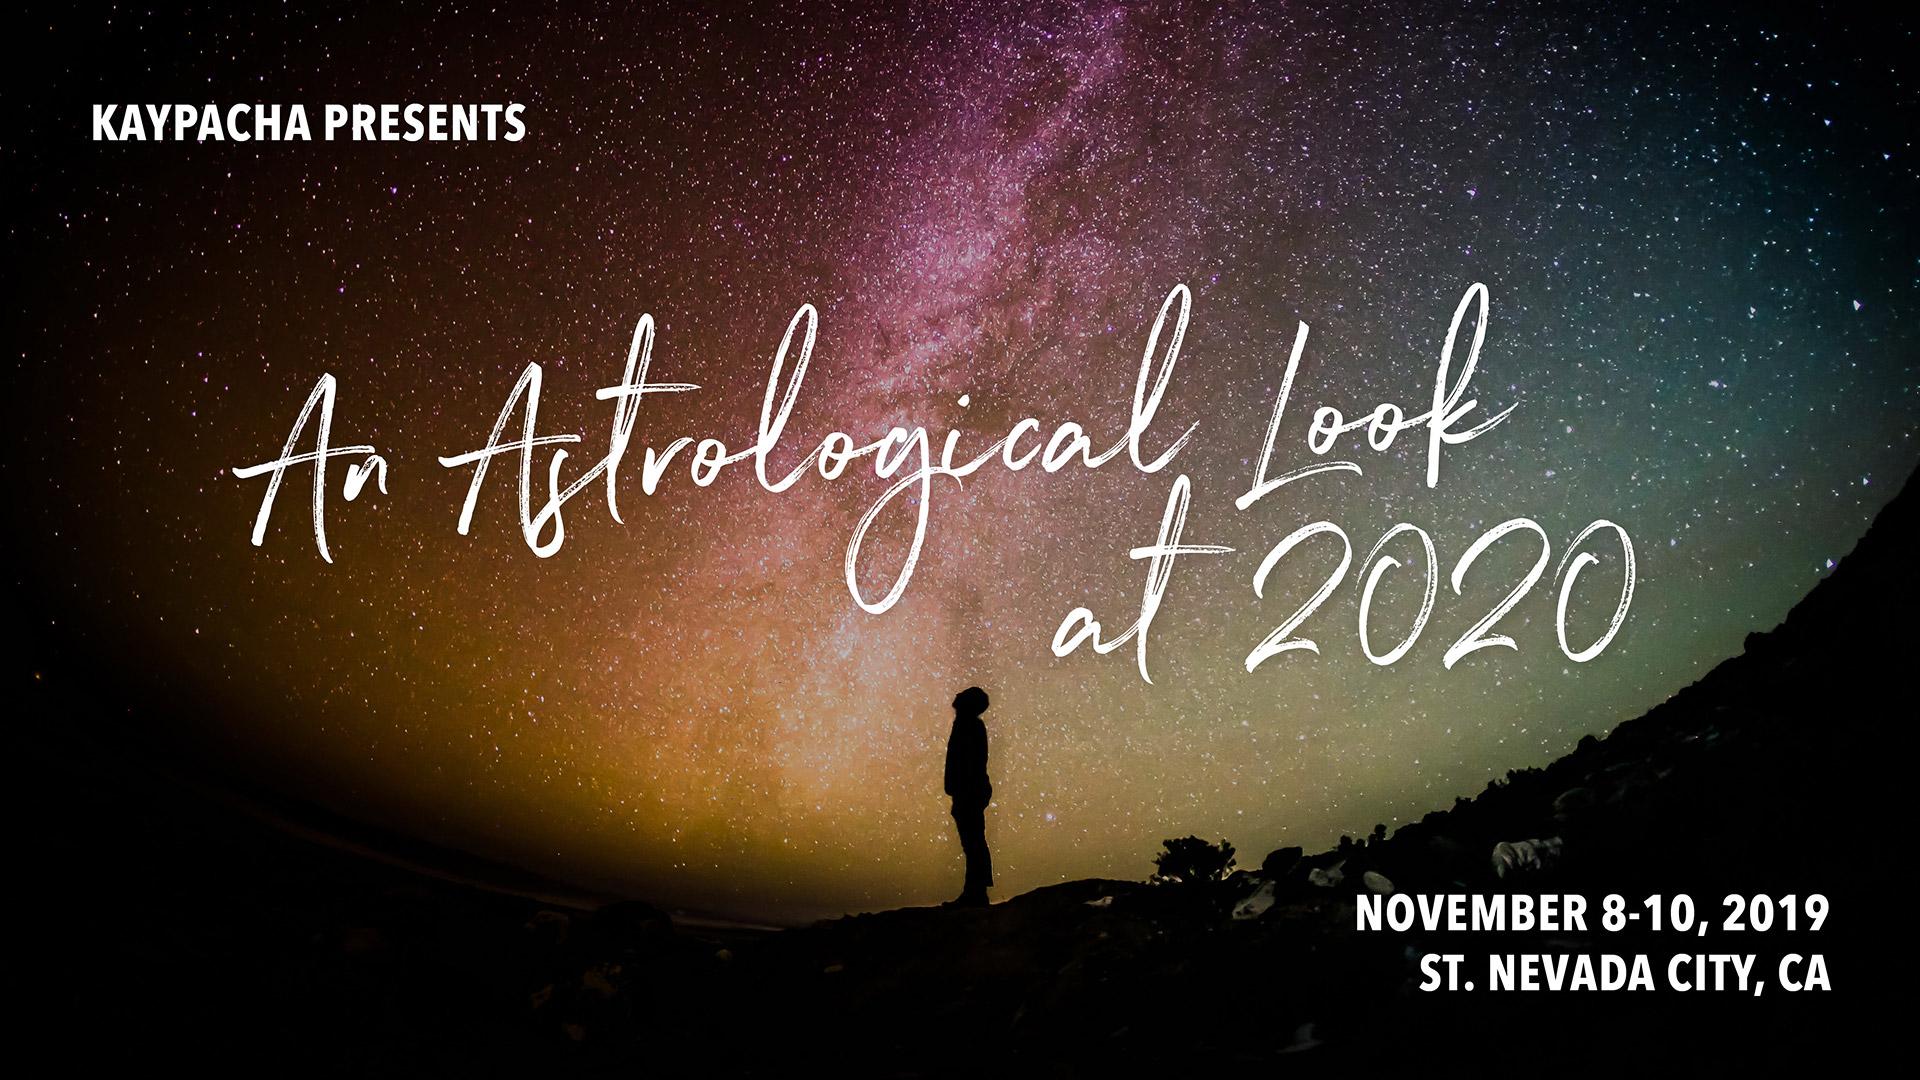 November 8-10, 2019 – An Astrological Look at 2020 – Nevada City, CA